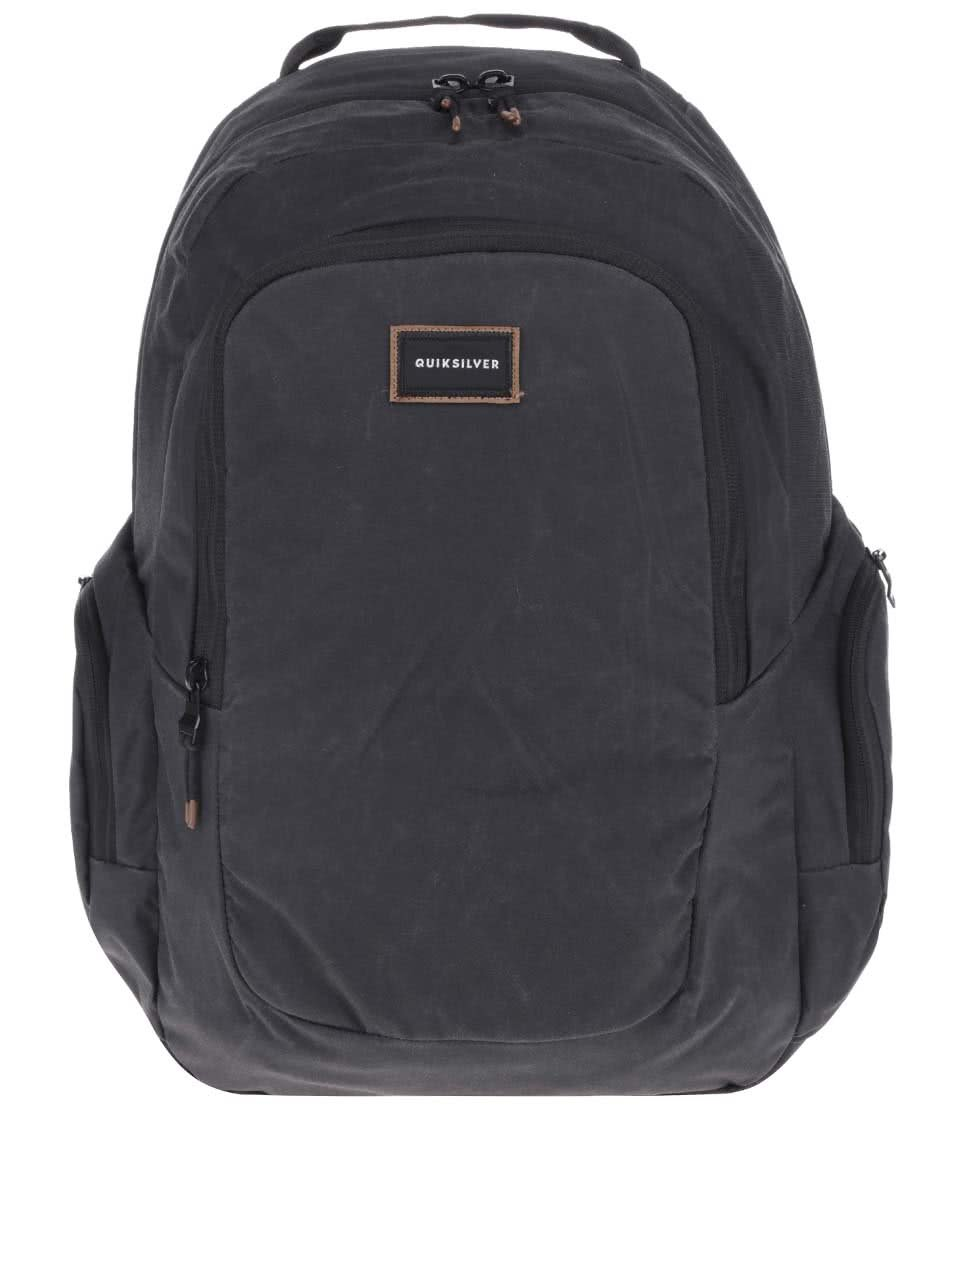 Černý pánský batoh s bočními kapsami Quiksilver Schoolie ... c43164f251